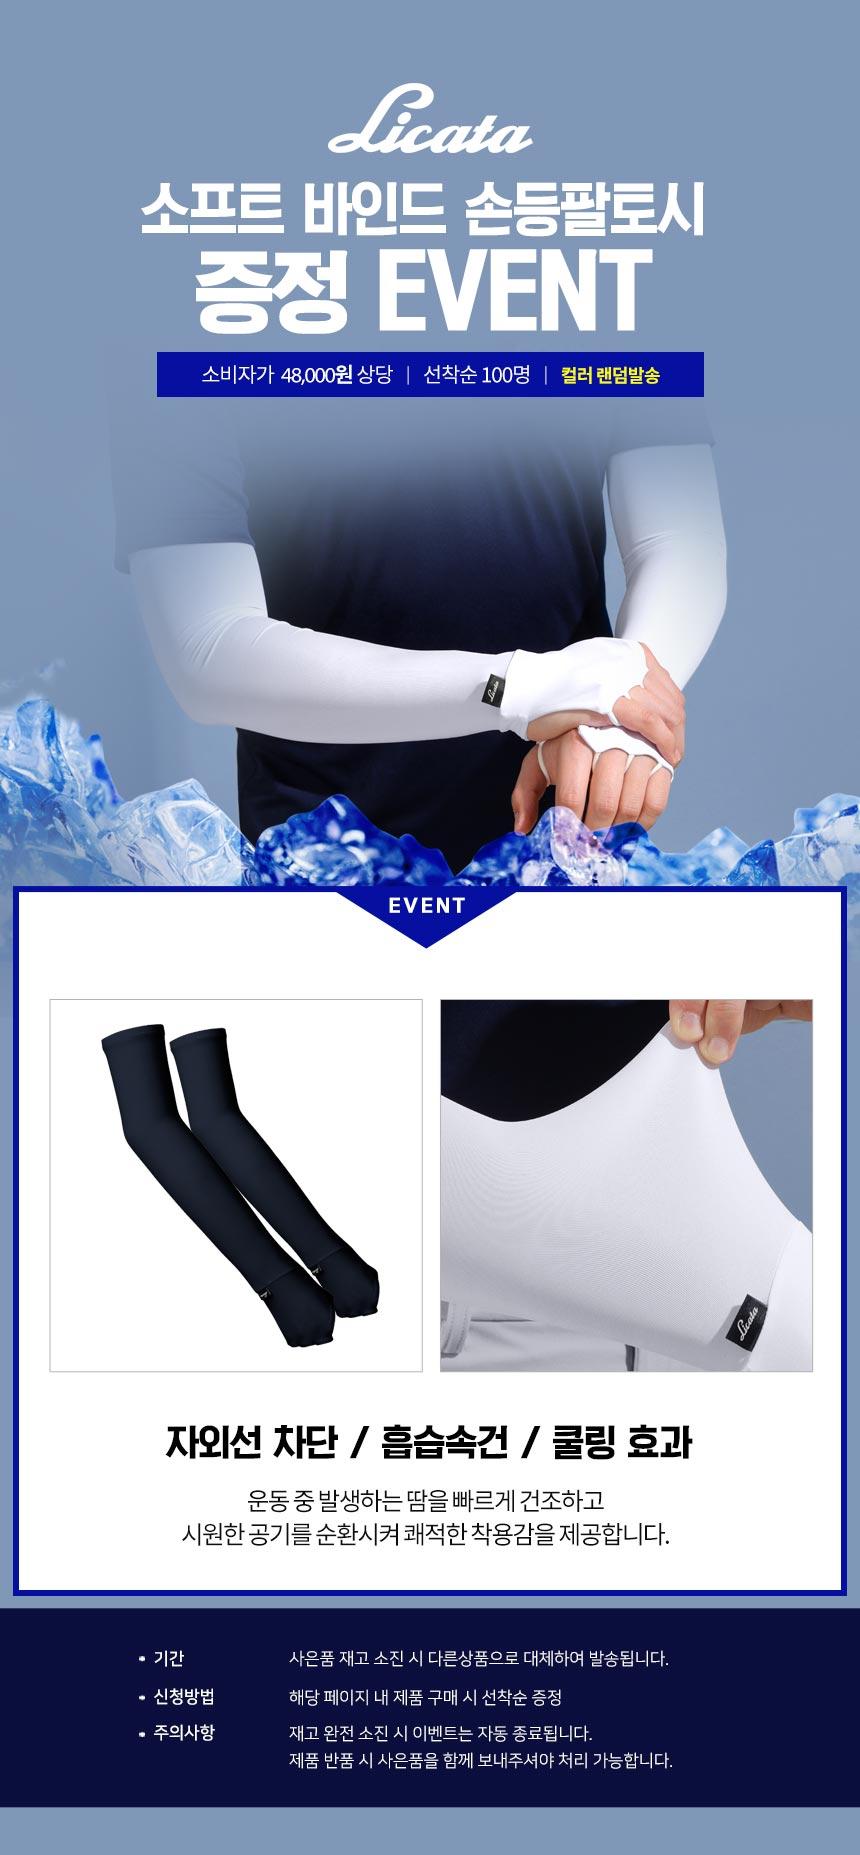 jxr_skin_arm_cover_gift_21.jpg